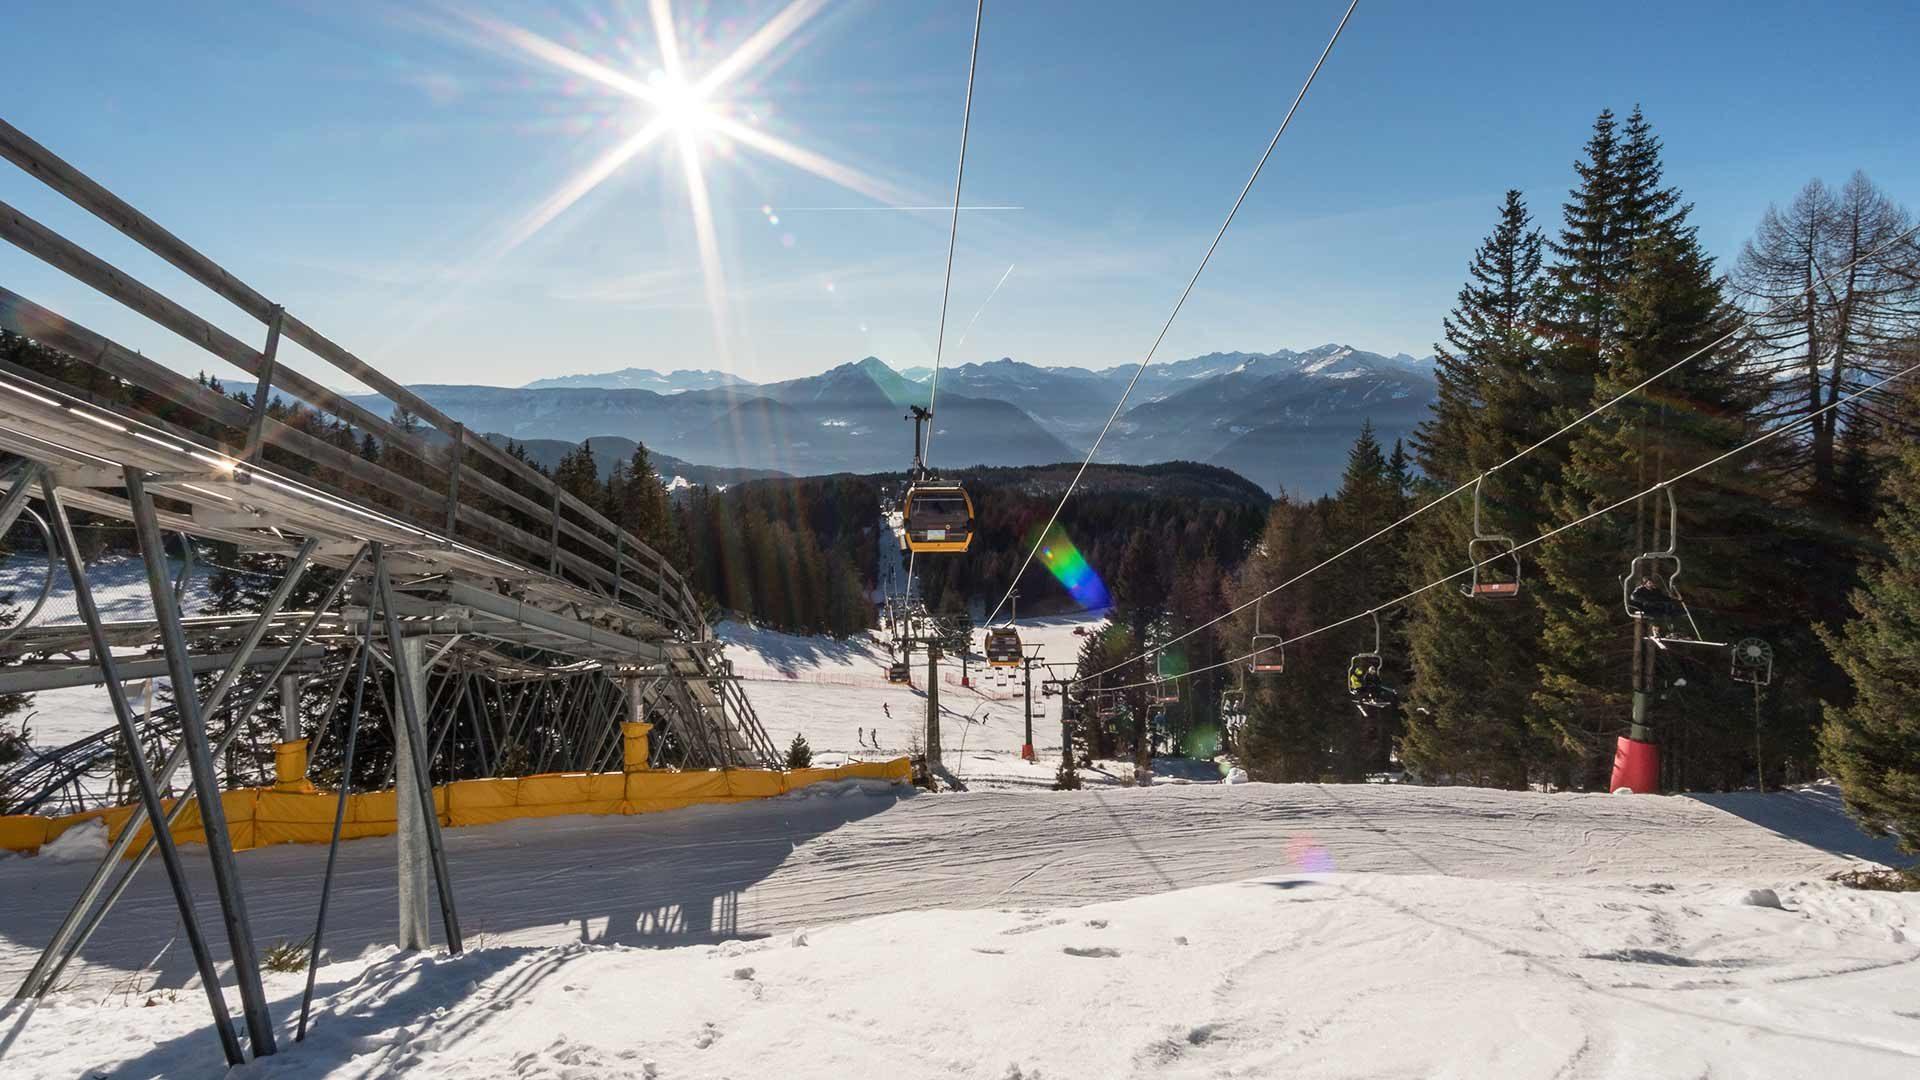 Skigebiet Meran 2000 - Skifahren